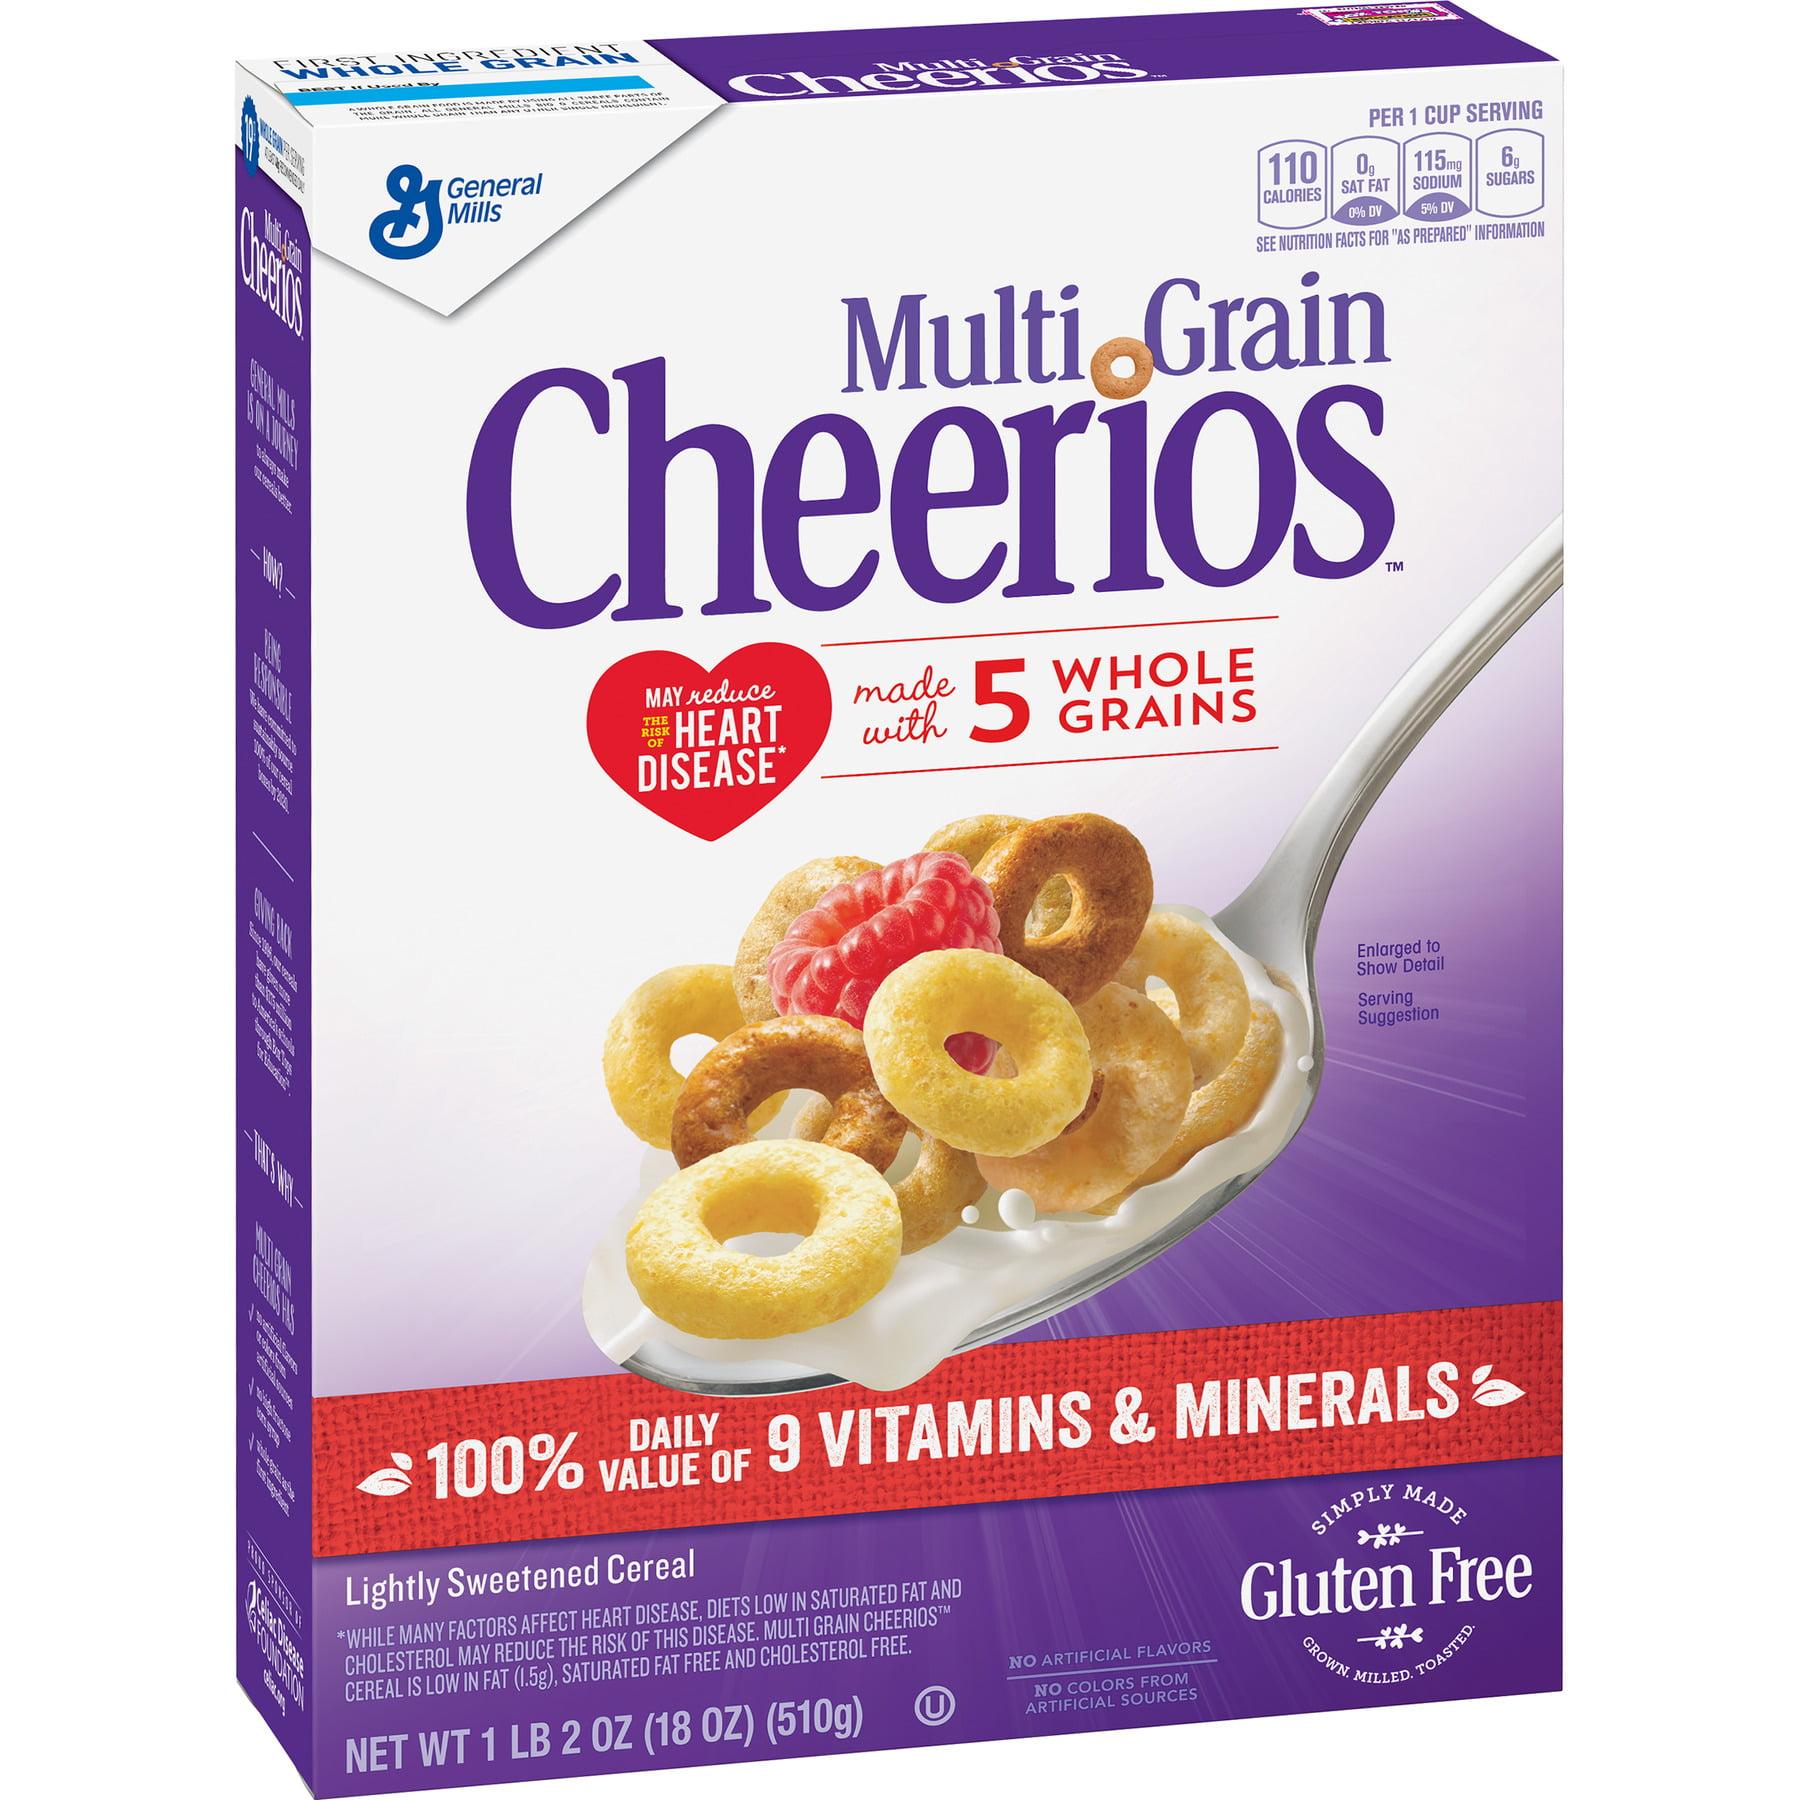 Multi Grain Cheerios Gluten Free Cereal, 18 oz